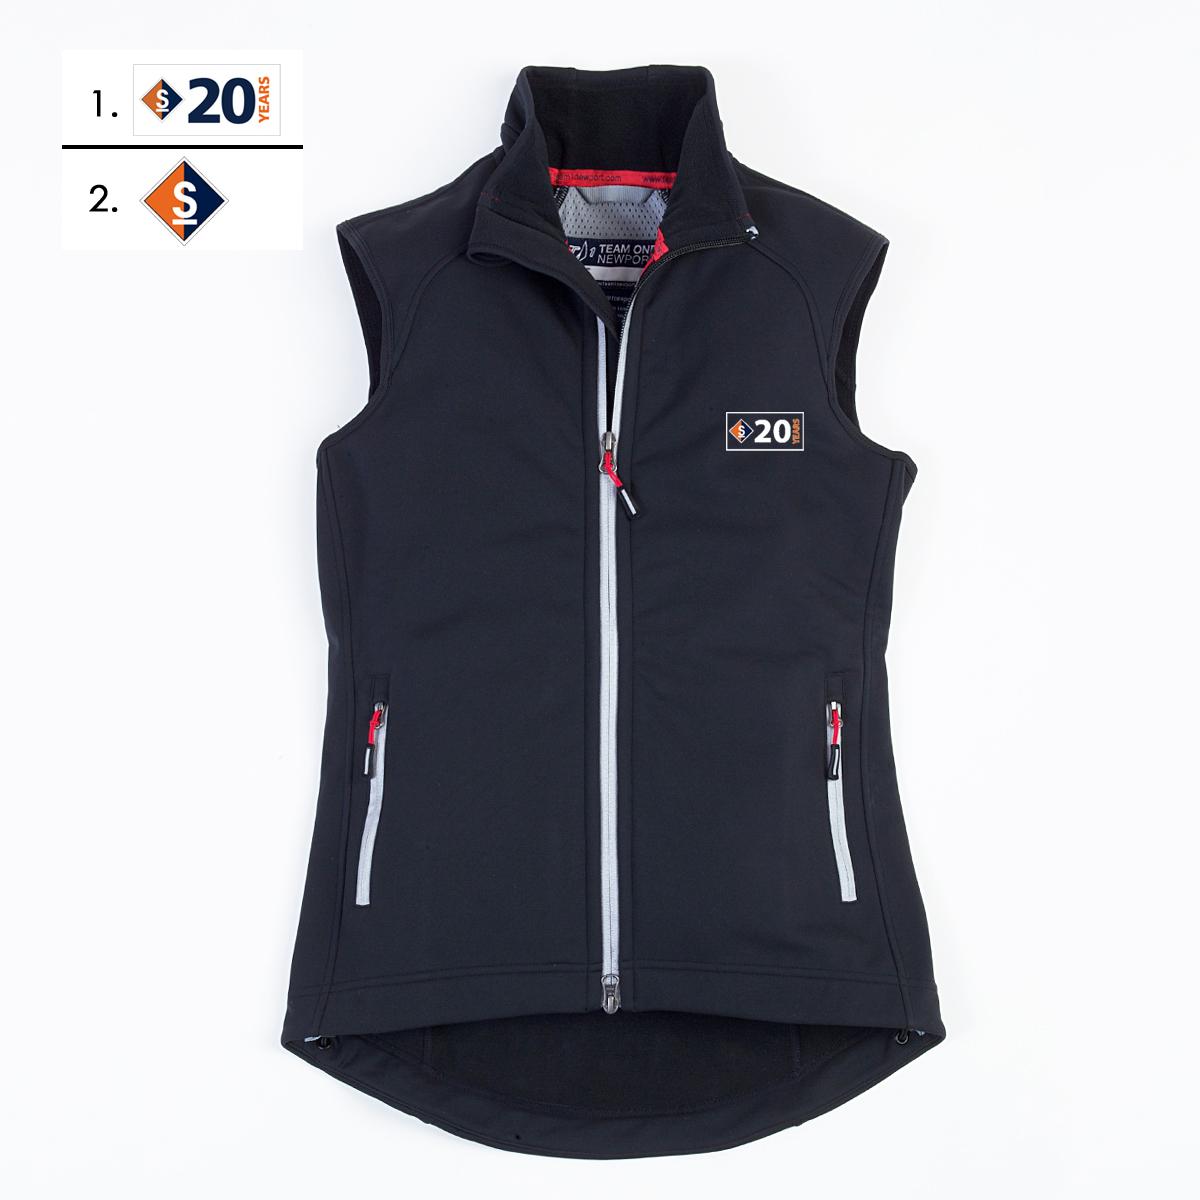 Sail Maine - Women's Scramber Softshell Vest (SME604)